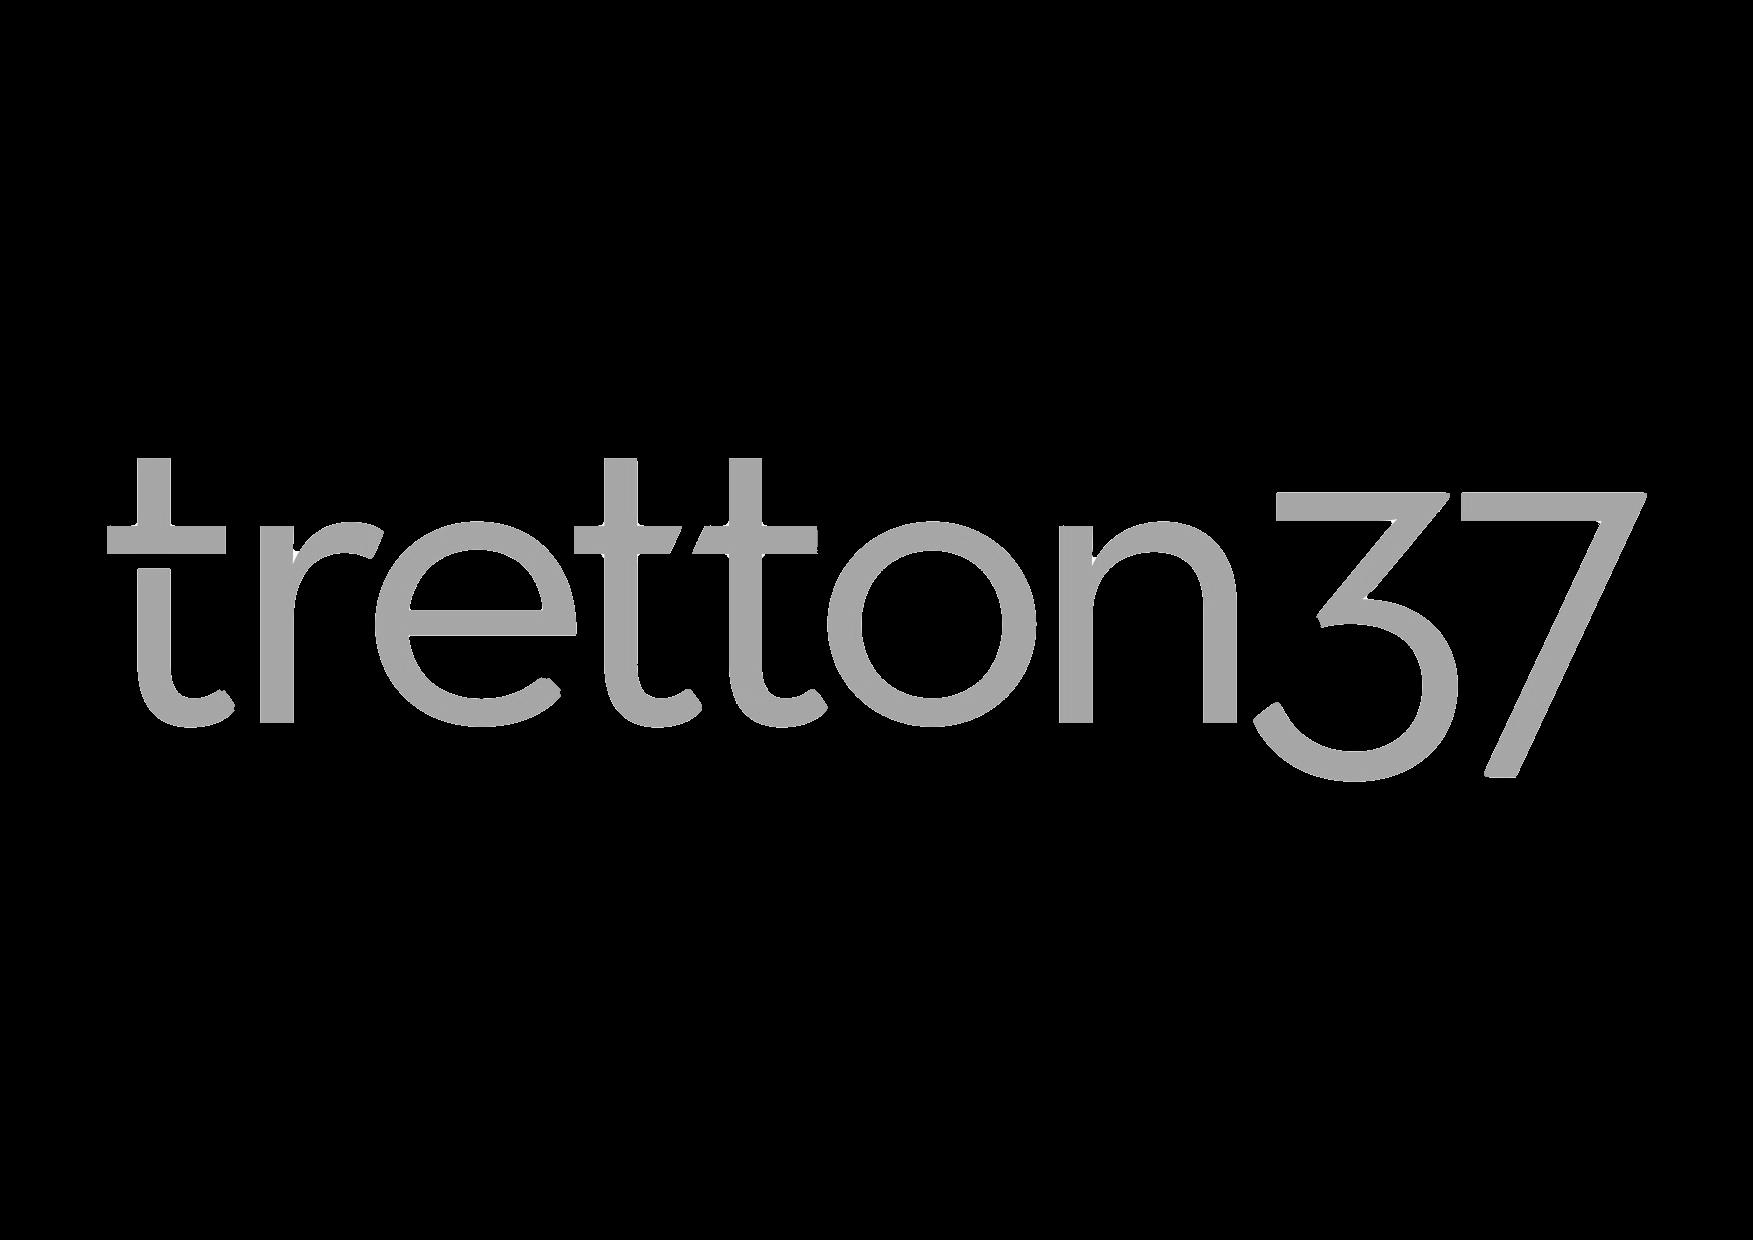 tretton37-logo-bw.png